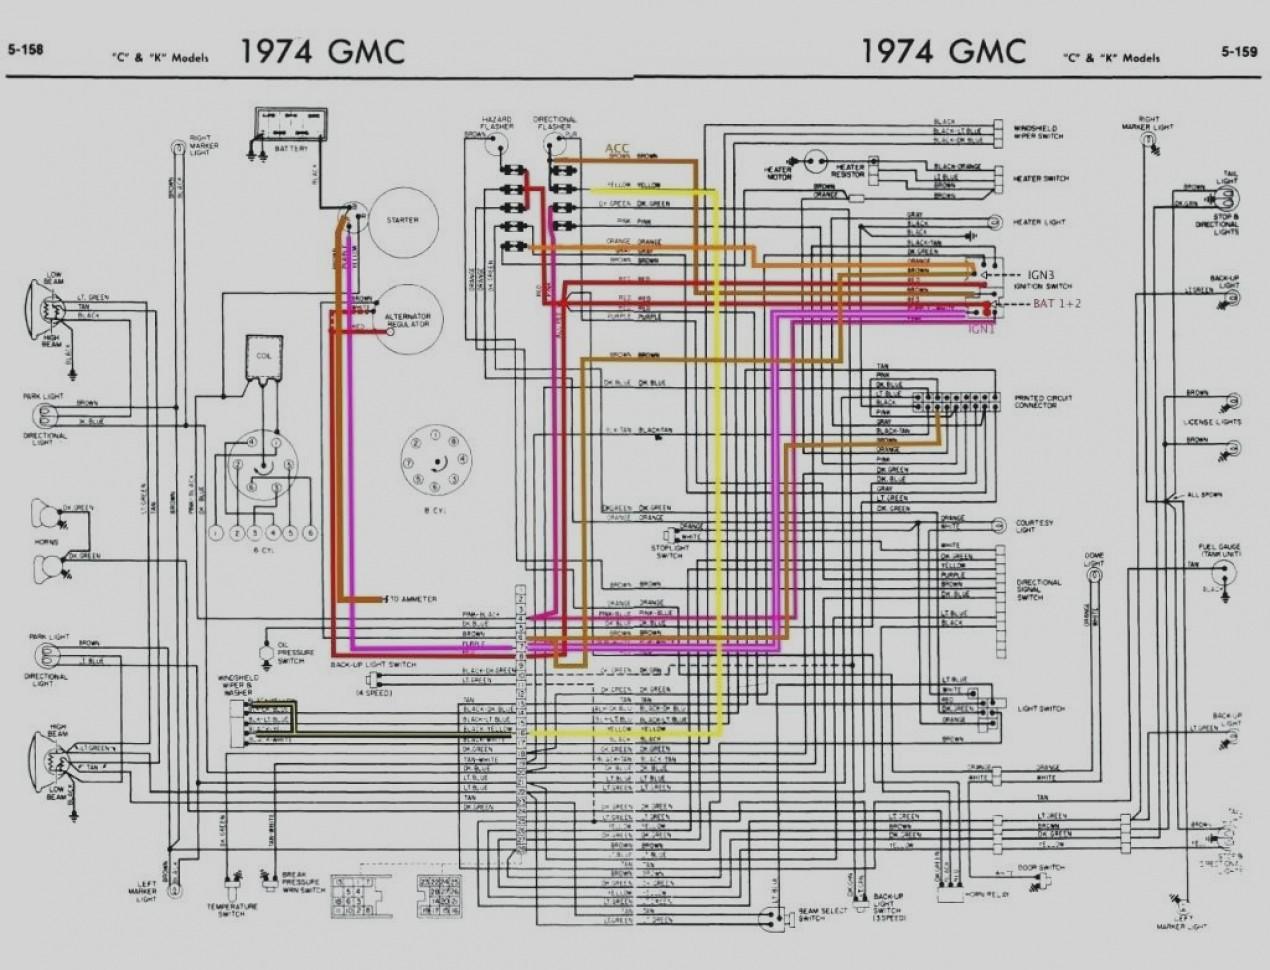 1975 Gmc Blazer Wiring - Wiring Diagram Progresif  Chevy Blazer Wiring Diagram on 1983 ford f150 wiring diagram, 1980 chevy pickup wiring diagram, 1975 chevy nova wiring diagram, 1979 chevy pickup wiring diagram, 1975 chevy k10 wiring diagram, 1974 chevy pickup wiring diagram, 1975 ford courier wiring diagram, 1975 chevy 350 wiring diagram, 1975 chevy k5 wiring diagram, 1973 chevy pickup wiring diagram, 1975 dodge dart wiring diagram, 1975 buick regal wiring diagram, 1975 ford f100 wiring diagram, 1975 pontiac firebird wiring diagram, 1975 jeep cj5 wiring diagram, 1966 ford f250 wiring diagram,